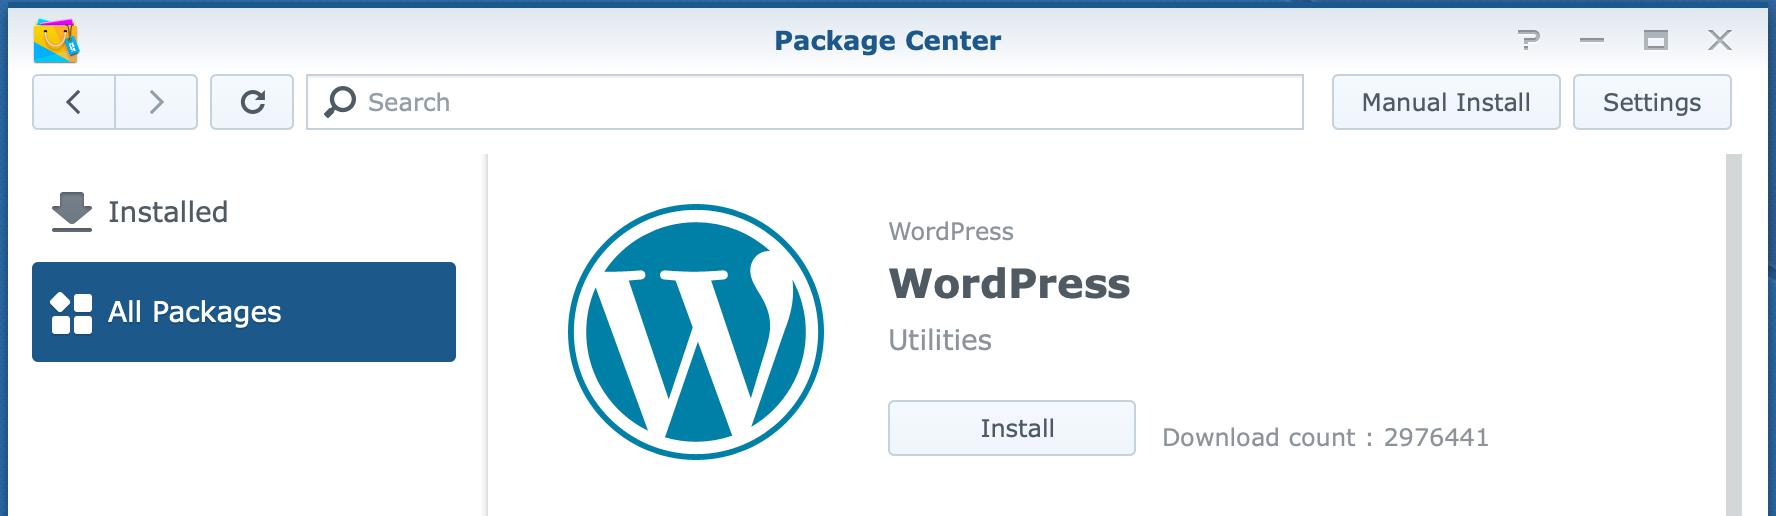 synology, package center, wordpress, dsm6